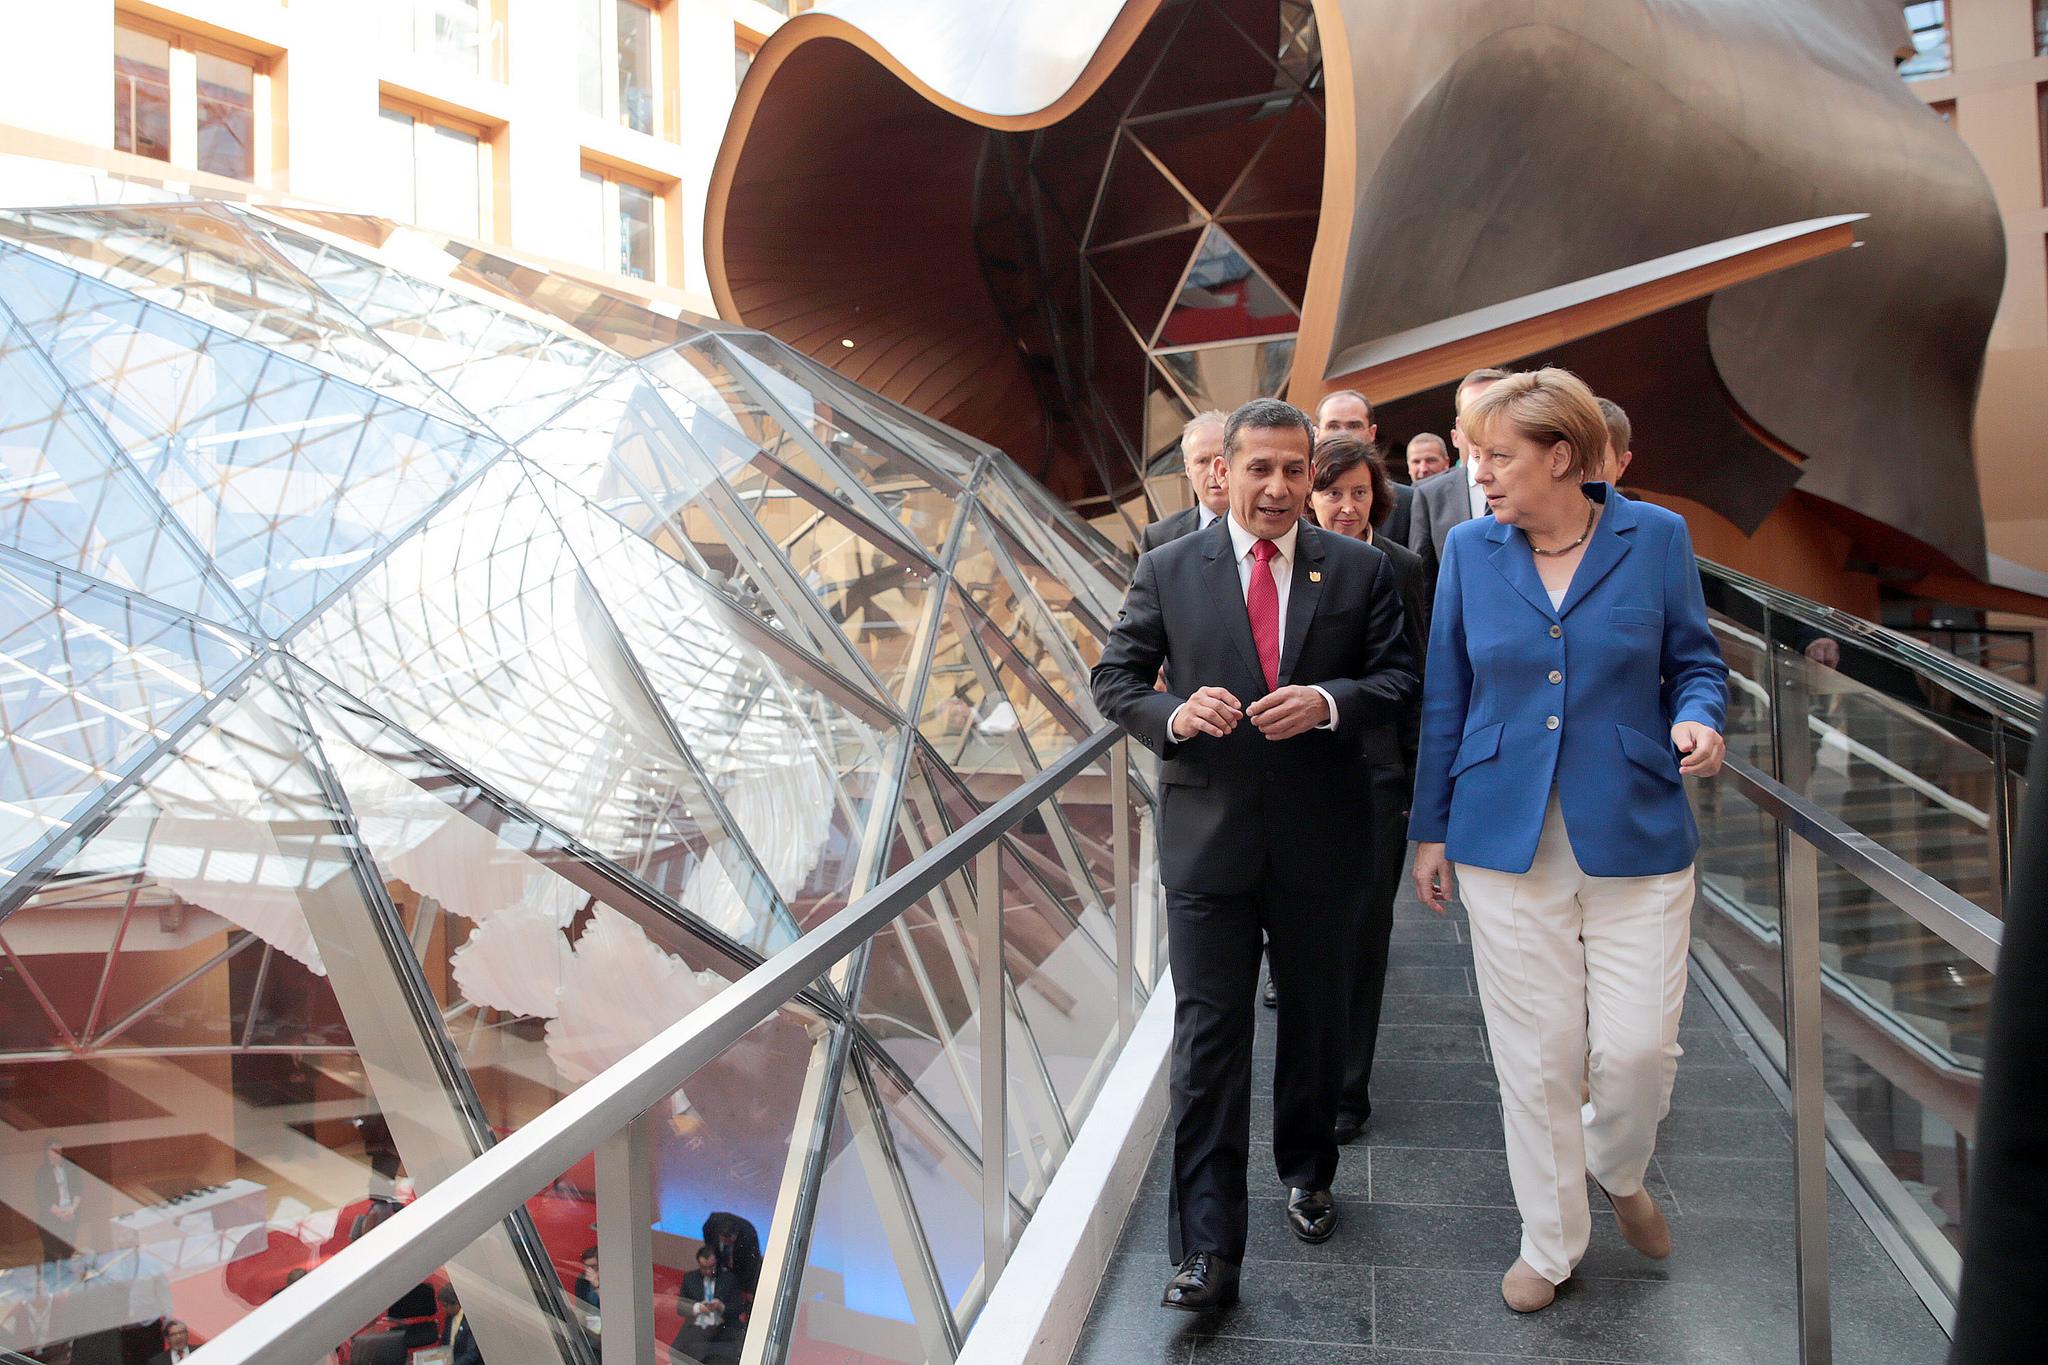 Peruvian President Ollanta Humala speaks with German Chancellor Angela Merkel during the political segment of the Fifth Petersberg Dialogue in Berlin. [Presidencia Perú/Flickr]